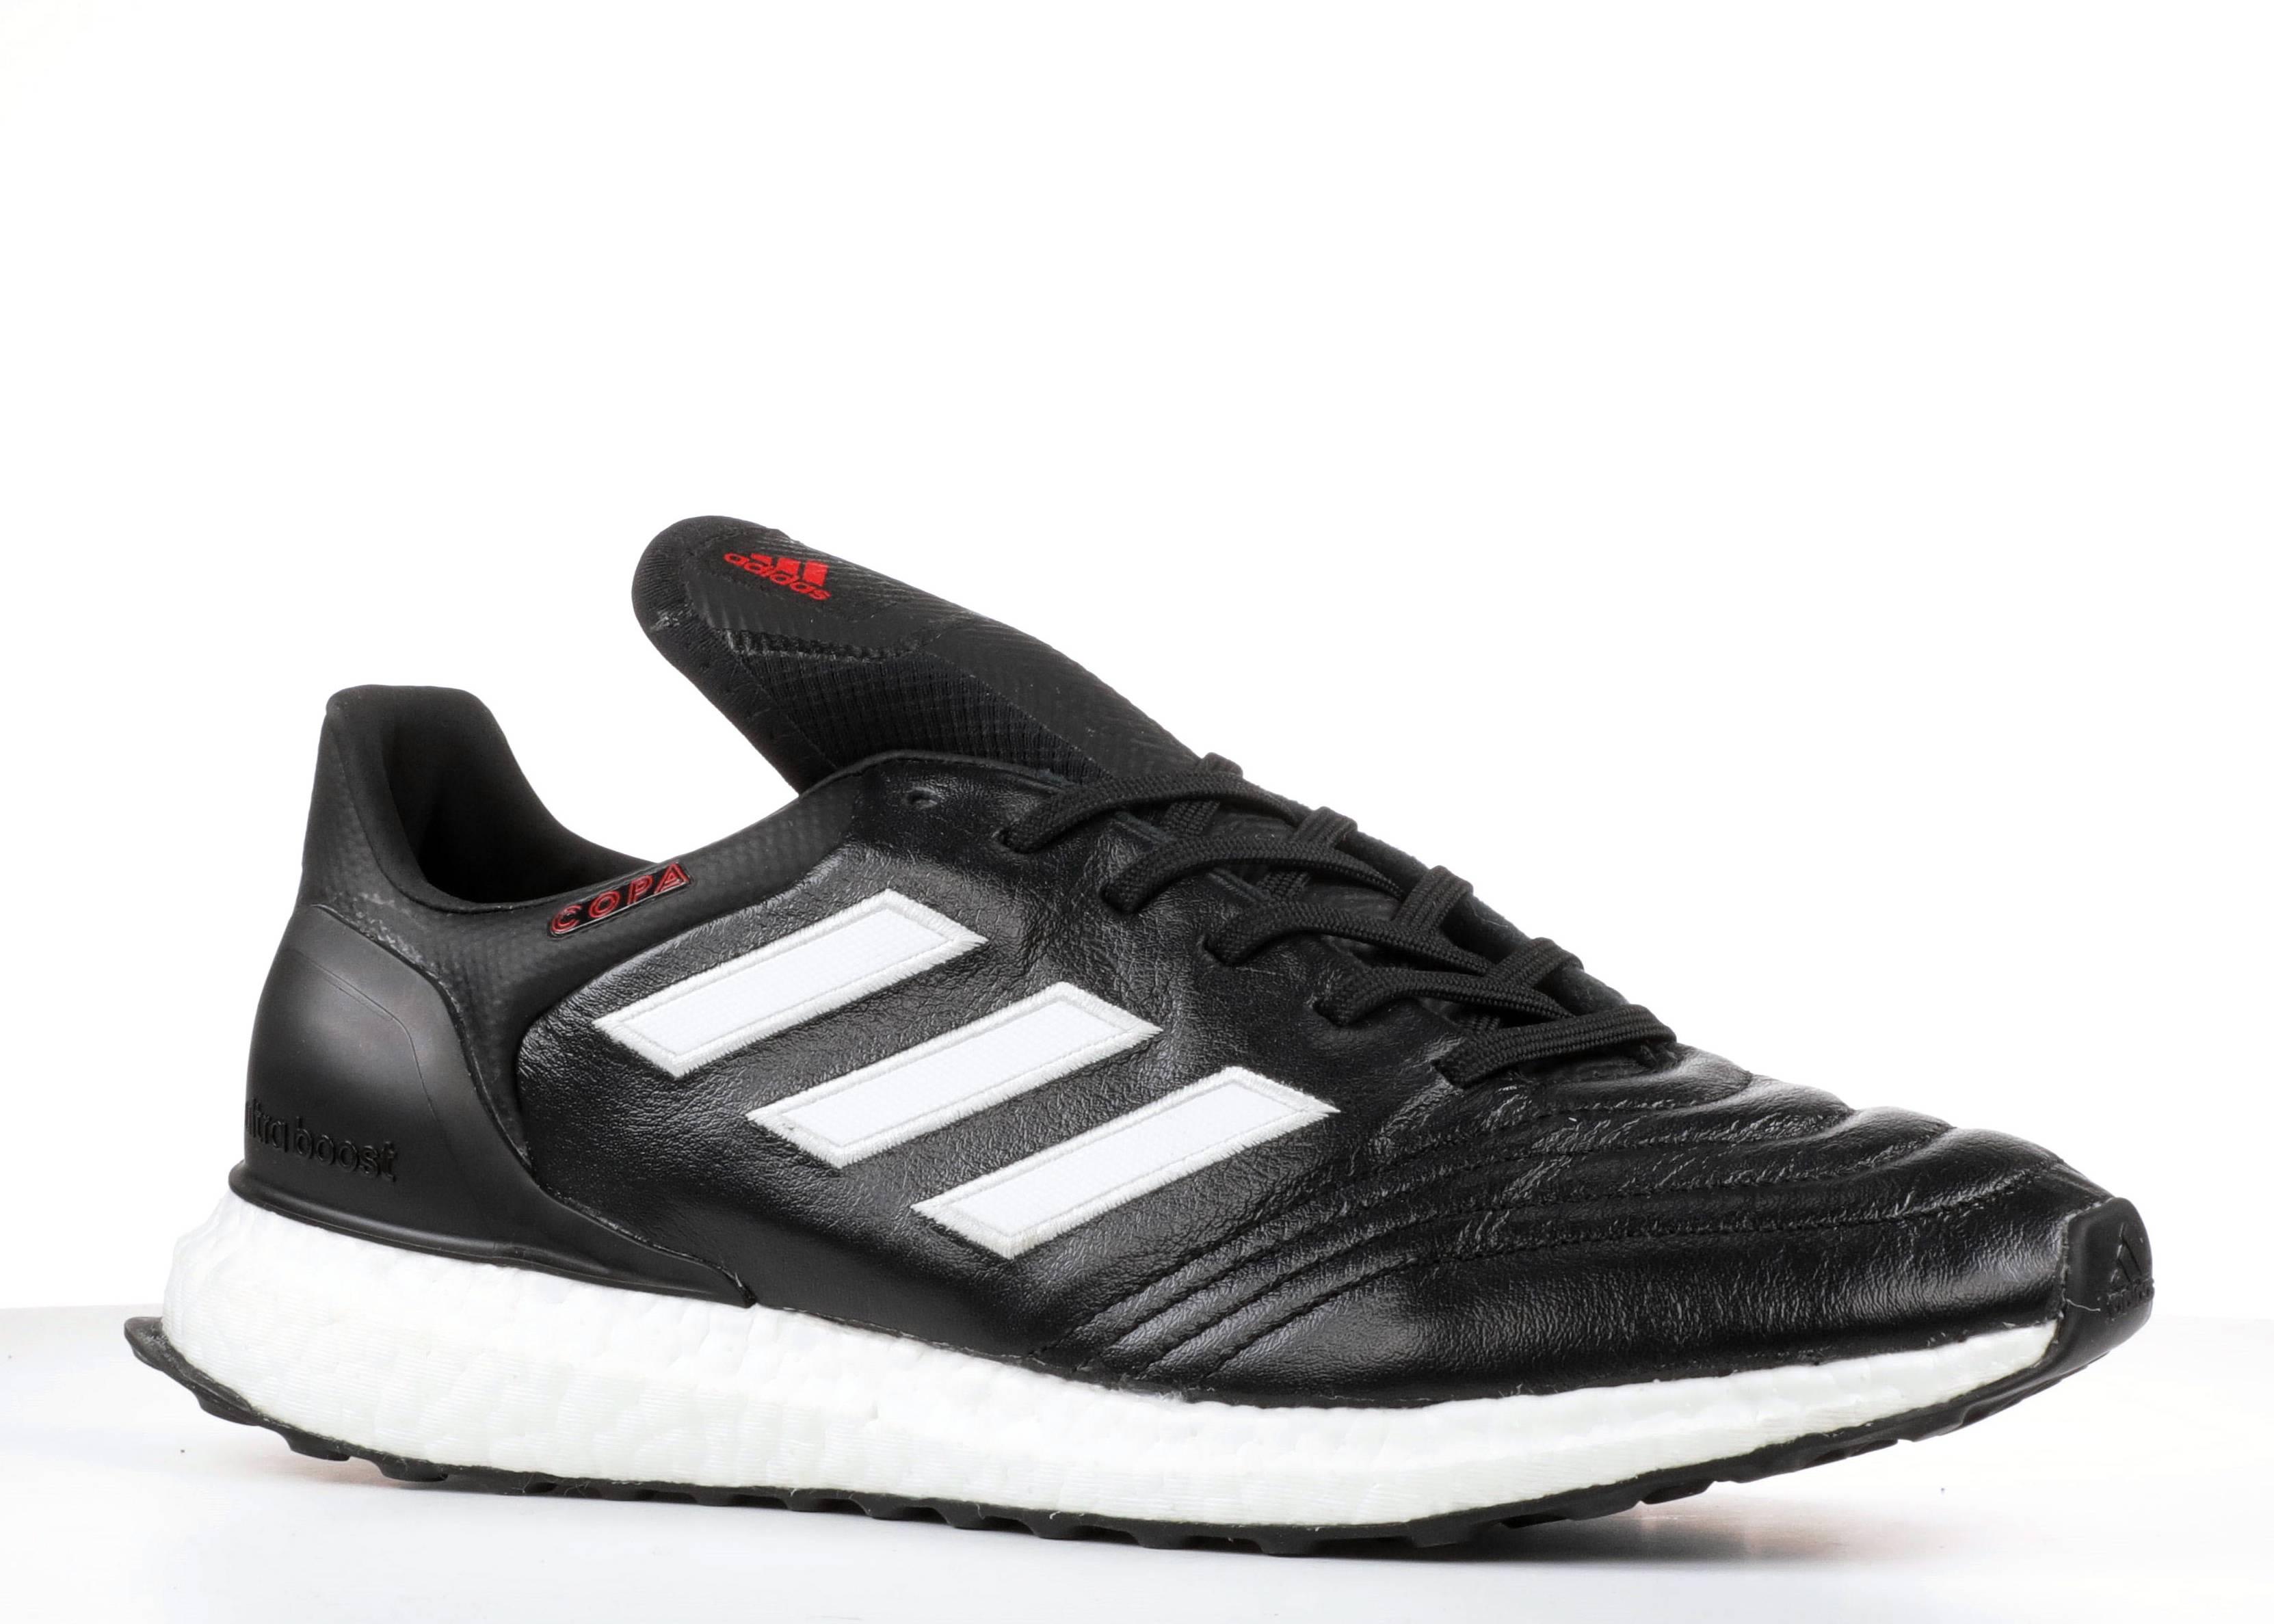 4fea0dec48914 Copa 17.1 Ultraboost - Adidas - cg3070 - cblack ftwwht red